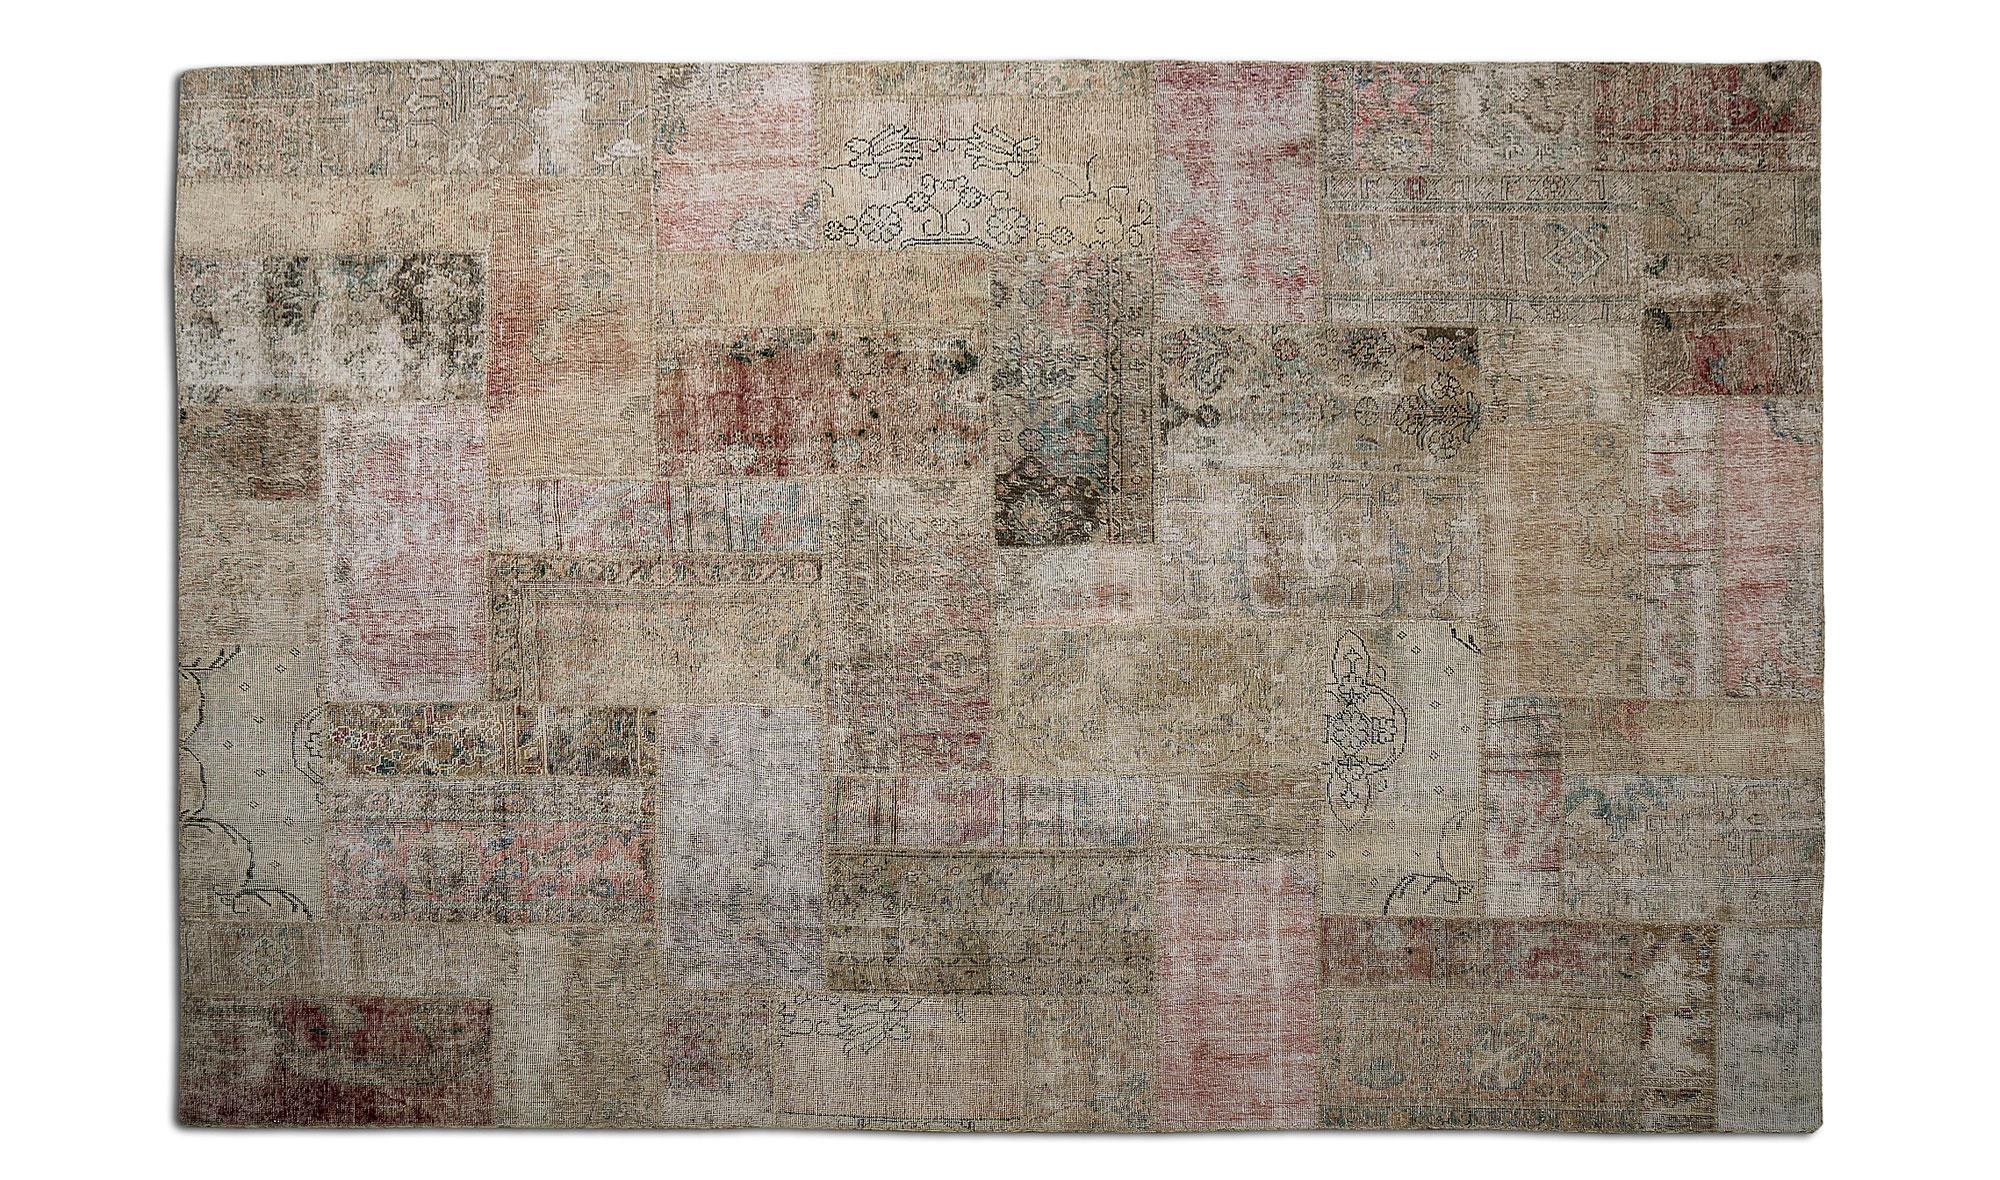 Alfombra patchwork odile en dec shop for Alfombras patchwork persas